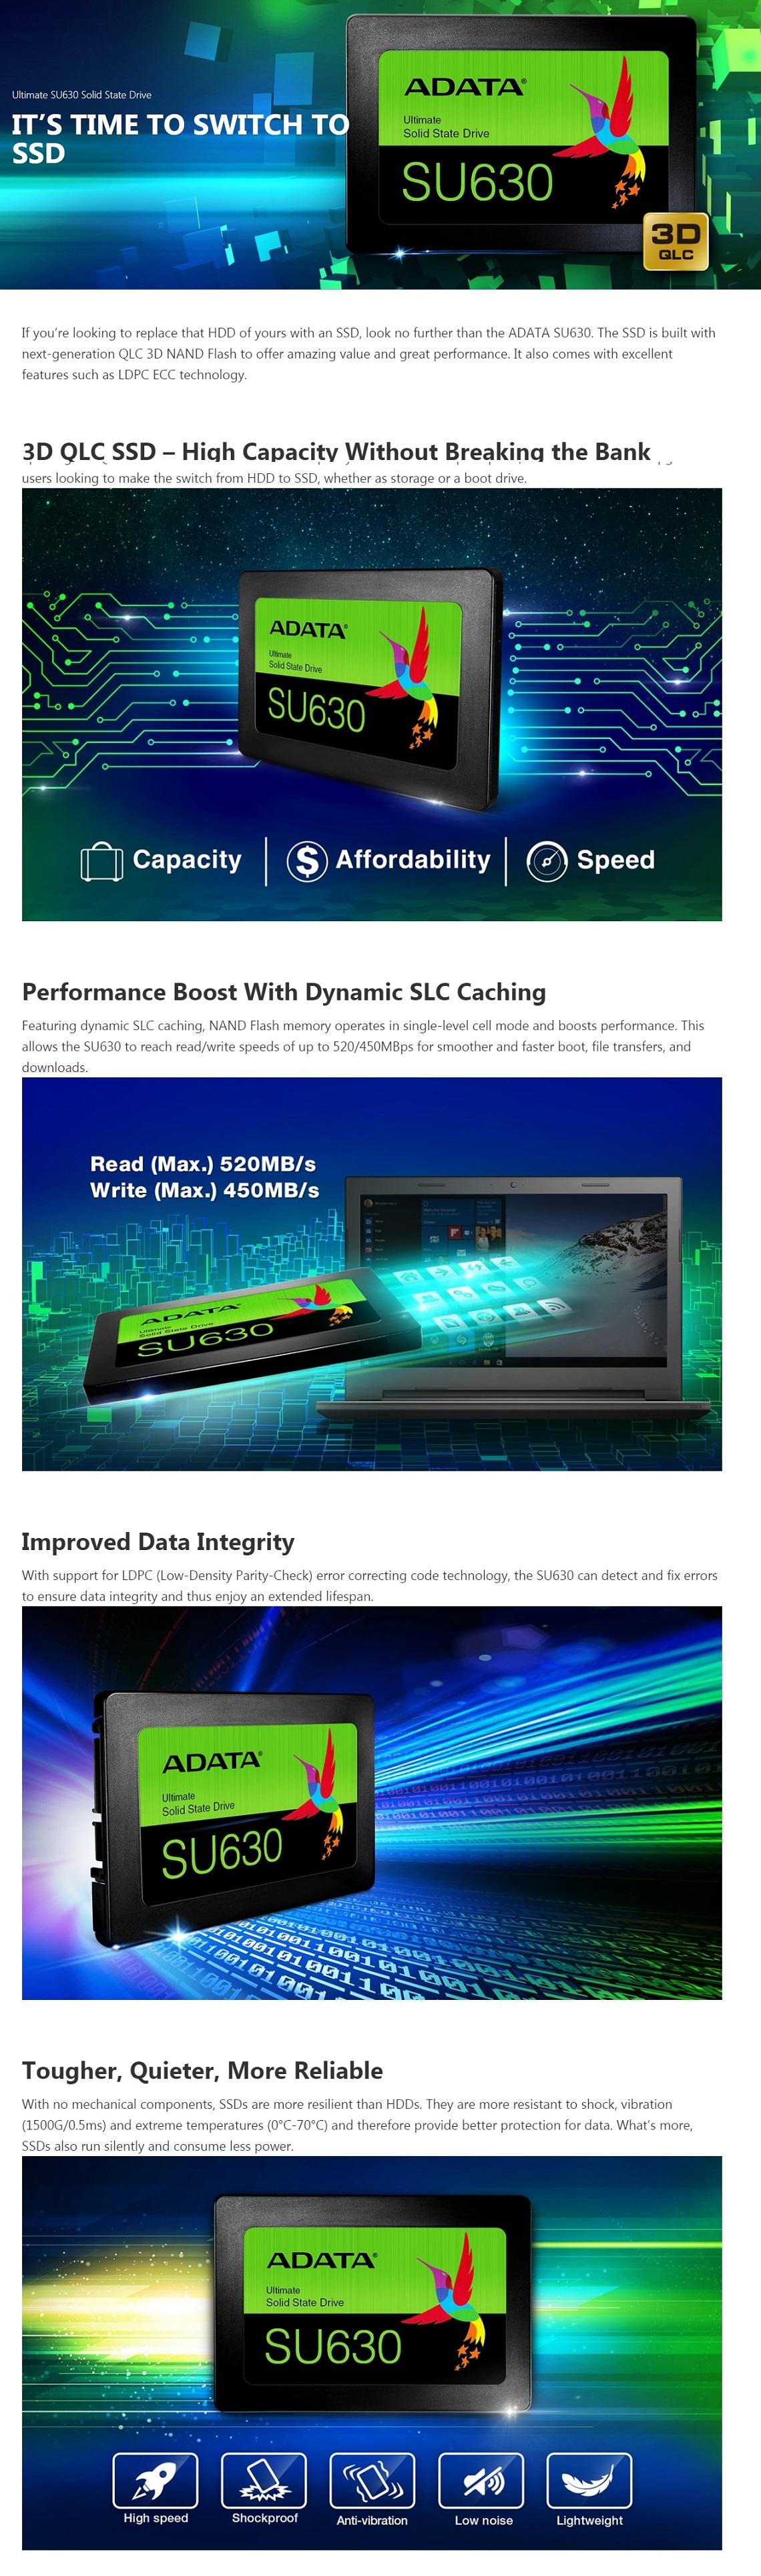 Adata 480GB Ultimate SU630 Solid State Drive QLC 3D NAND Flash SATA 2.5